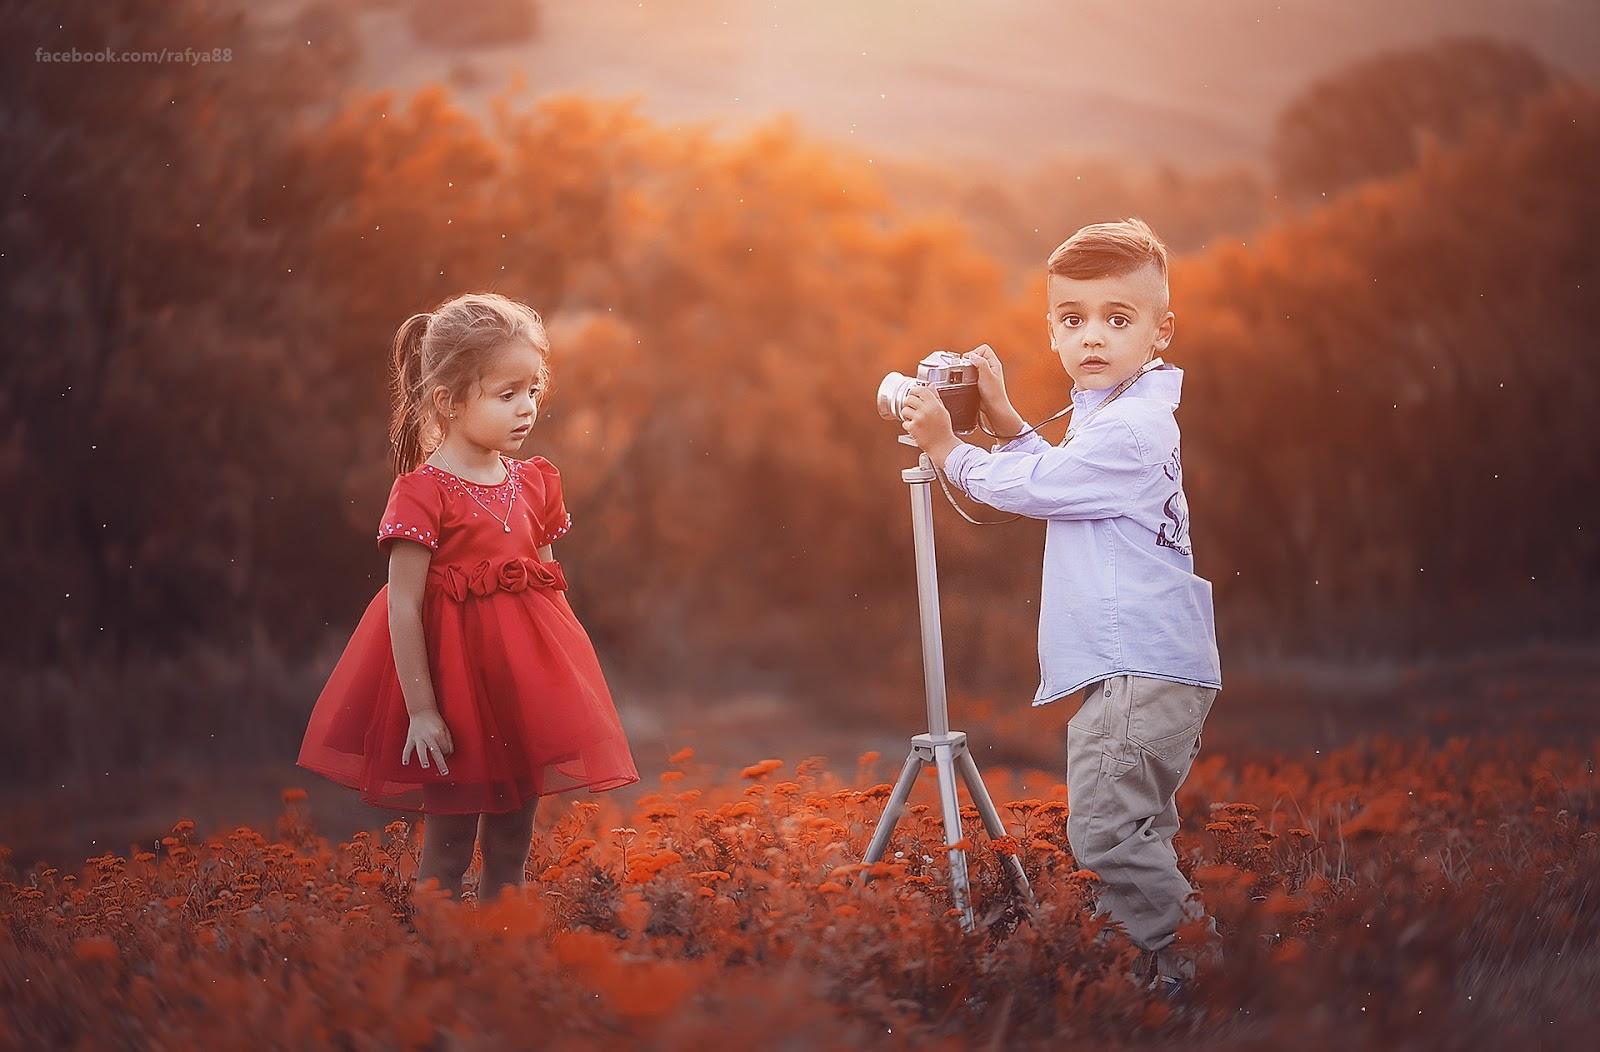 Dramatic warm autumn color effect tutorial photoshop rafy a for Ideas with photos